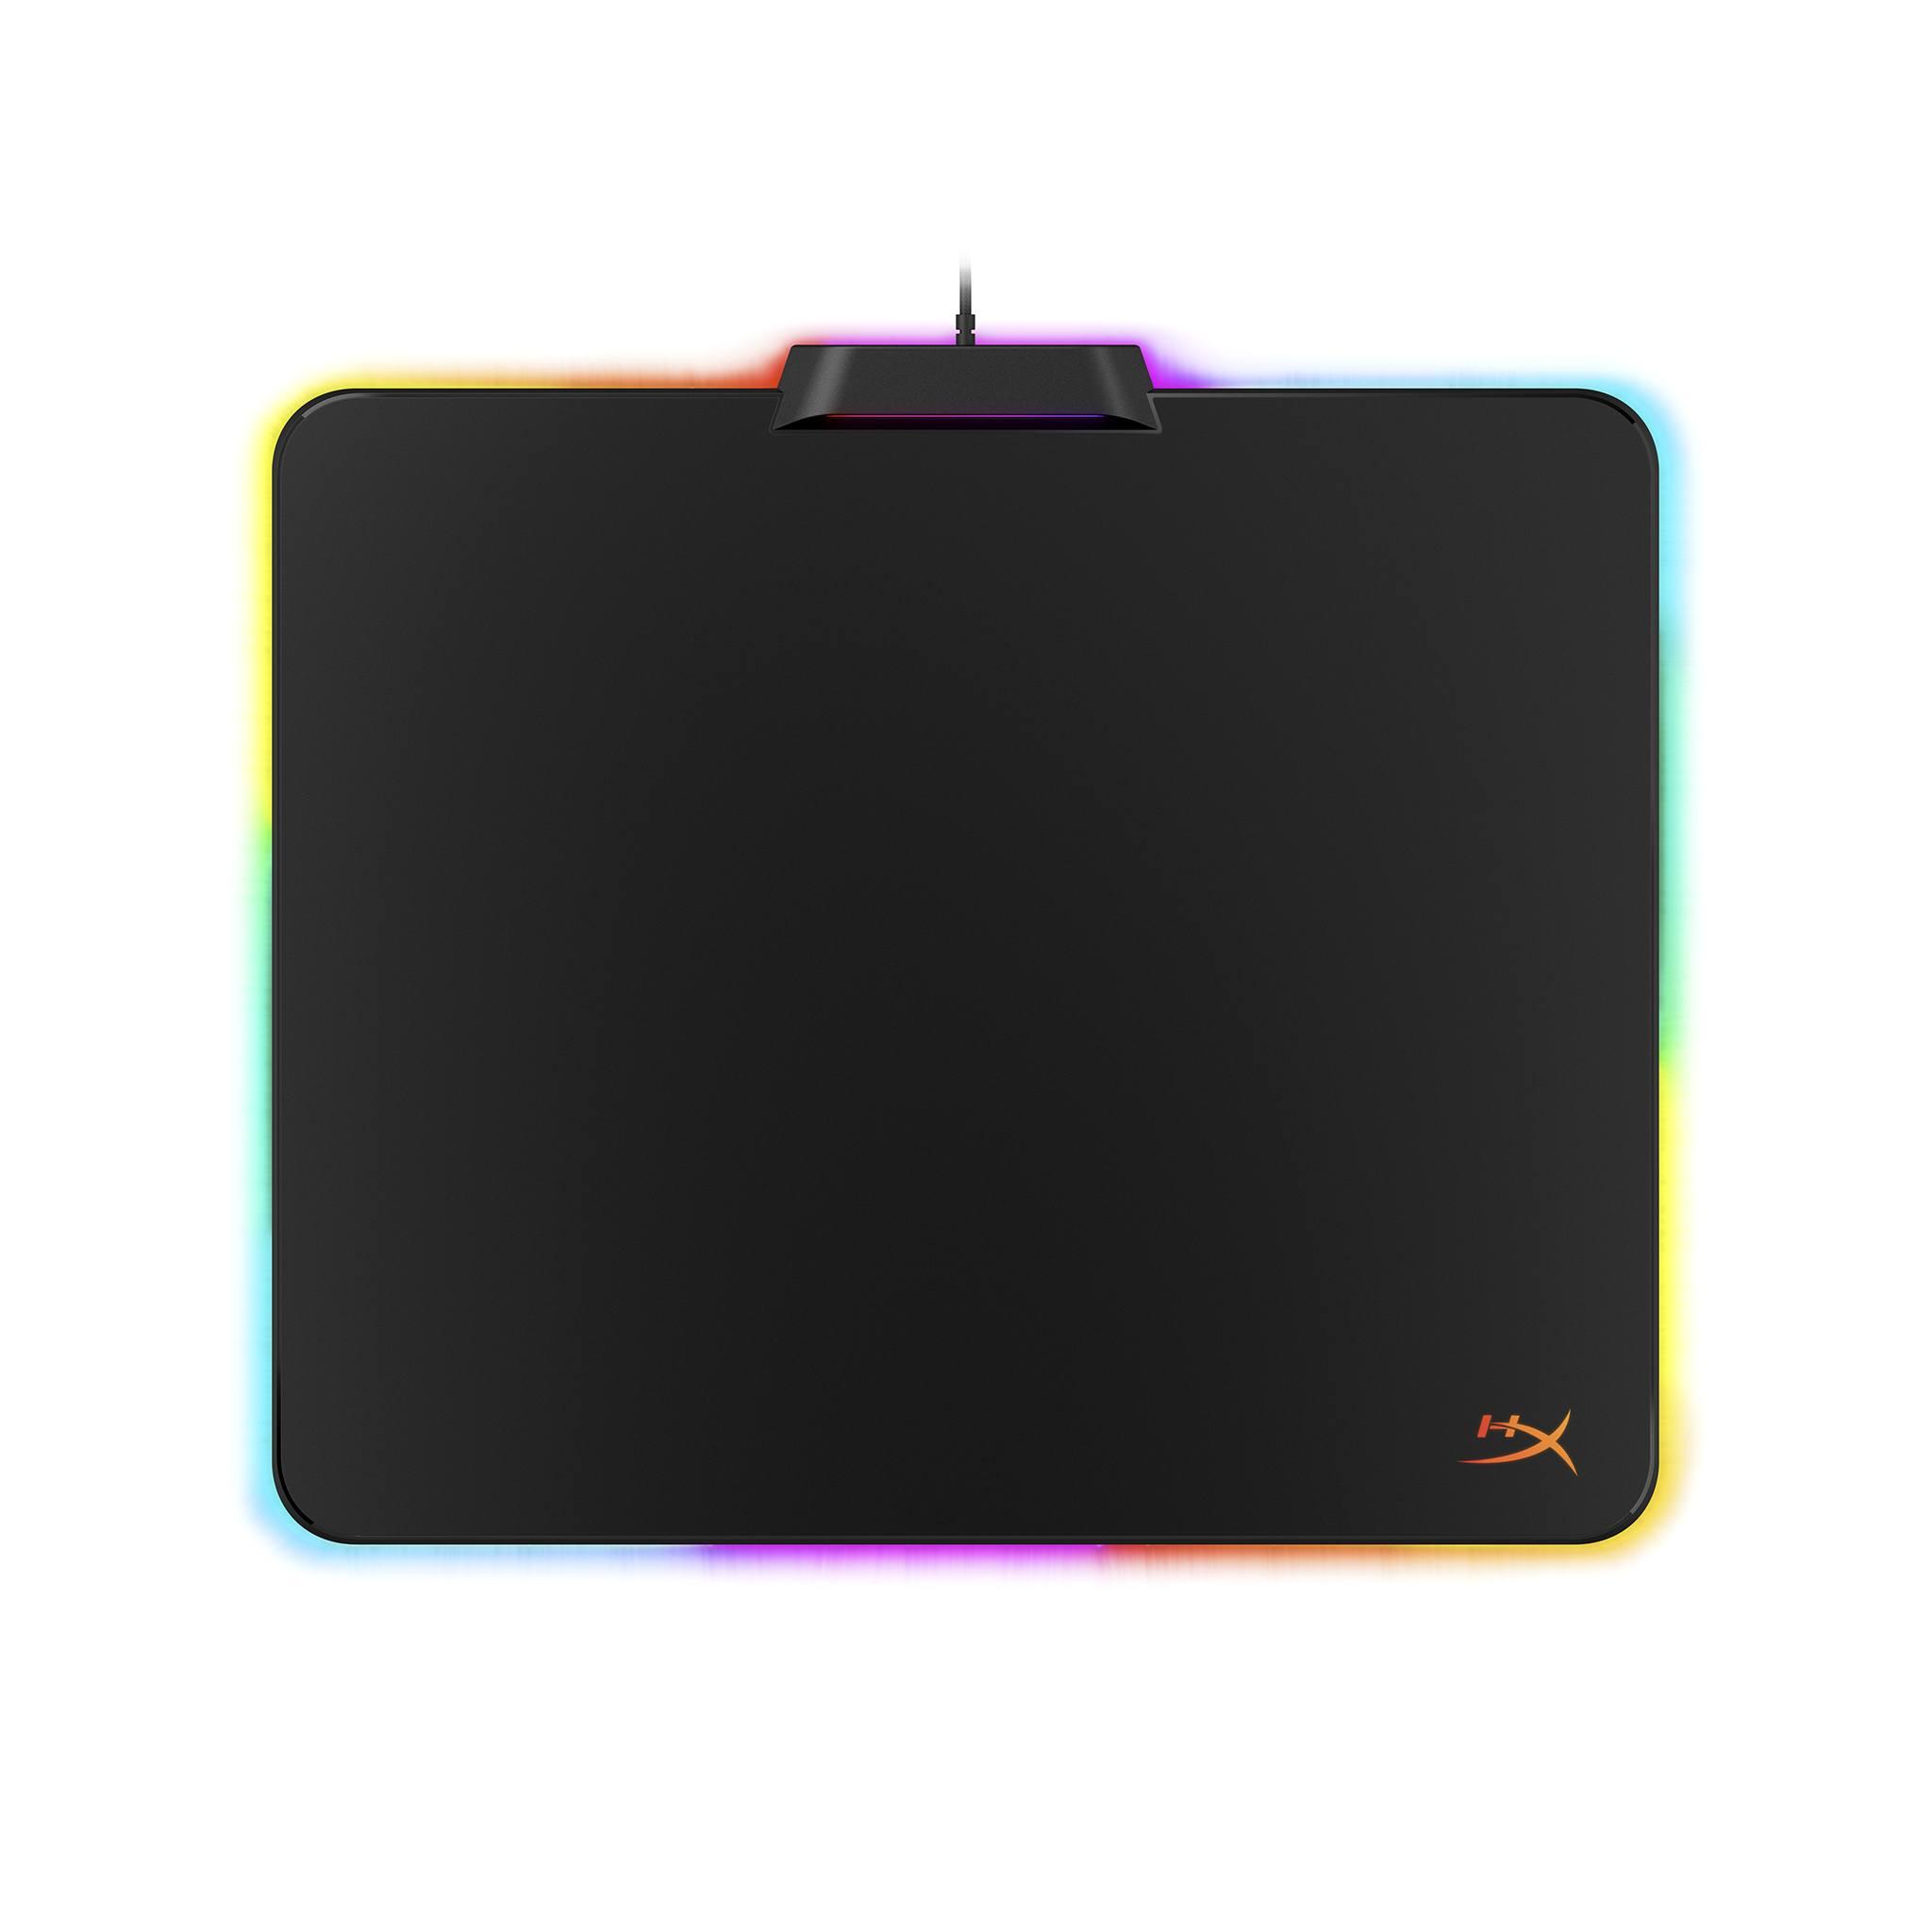 Mouse Pad HyperX Fury Ultra RGB Led